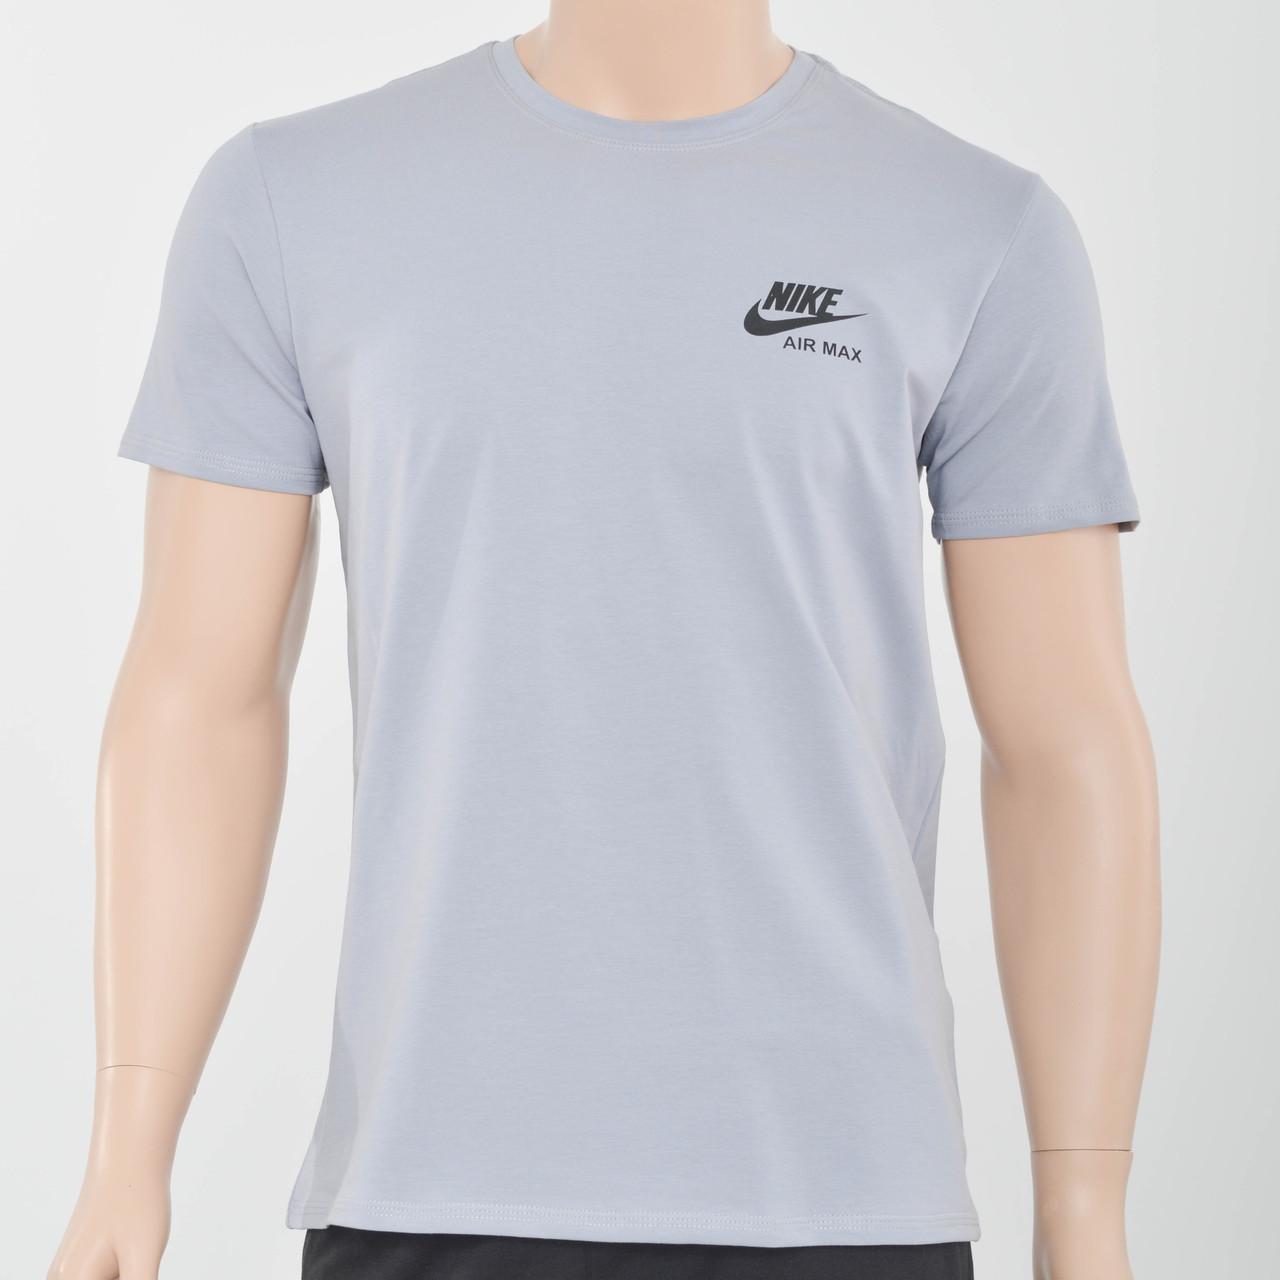 Мужская футболка с накаткой Nike (реплика) светлый серый